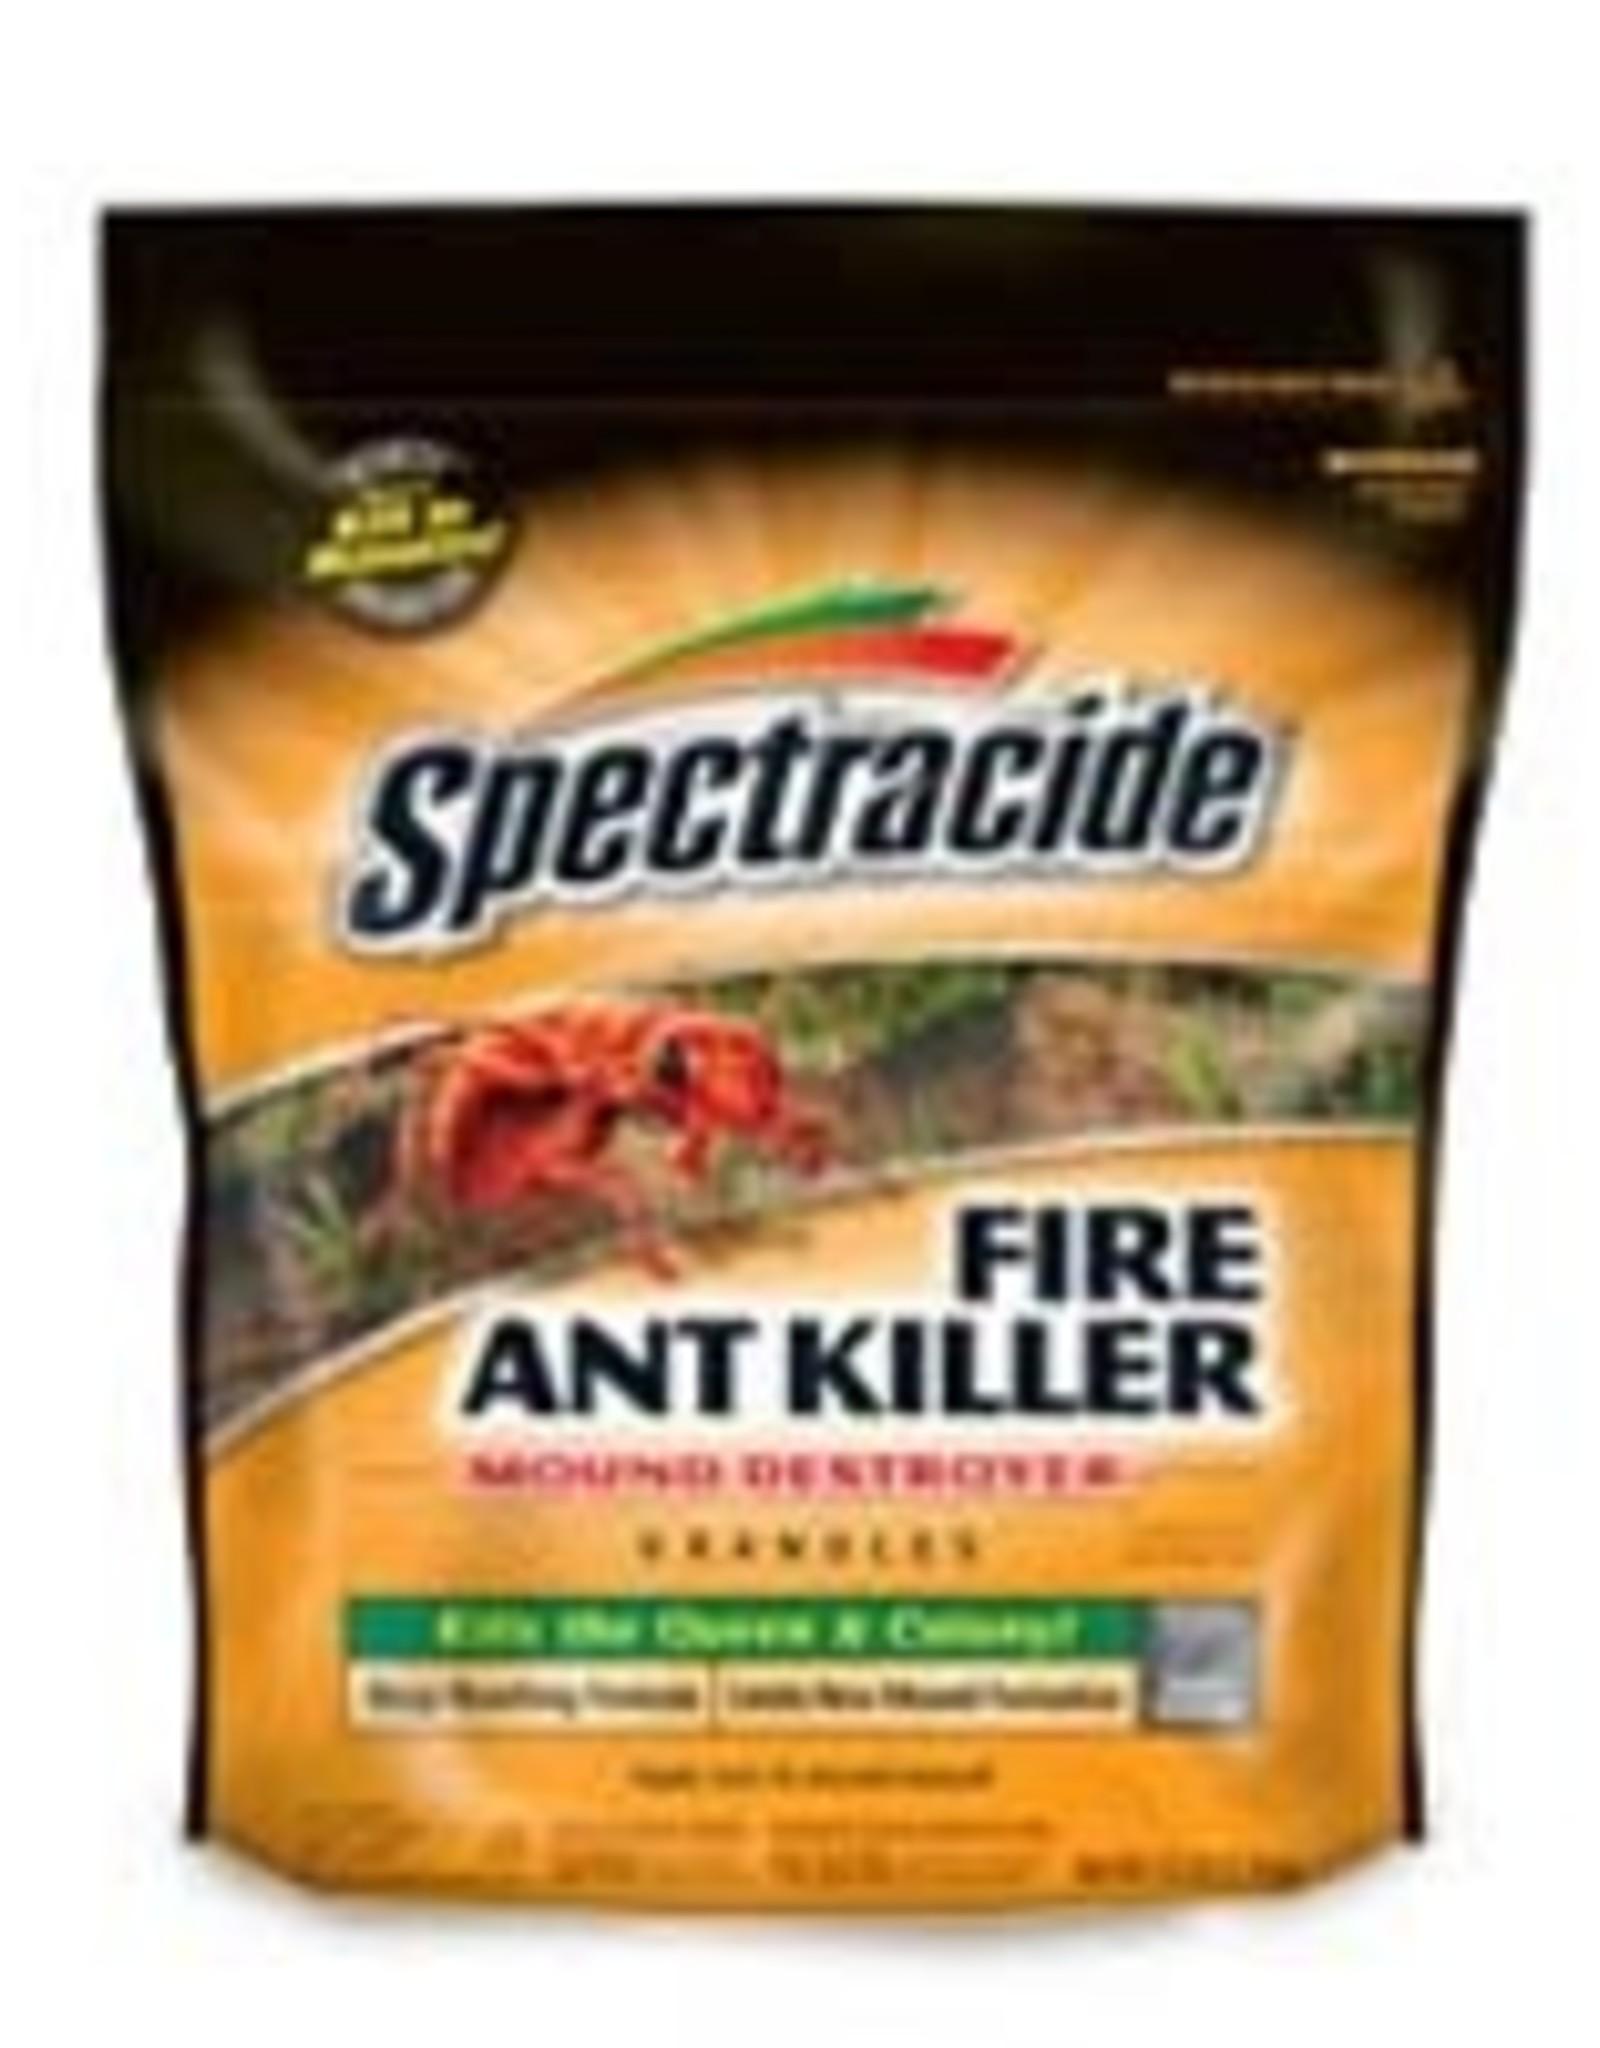 United Ind. Corp/Spectrum Spectracide Fire Ant Shield Mount Destroyer Killer 3.5 lb